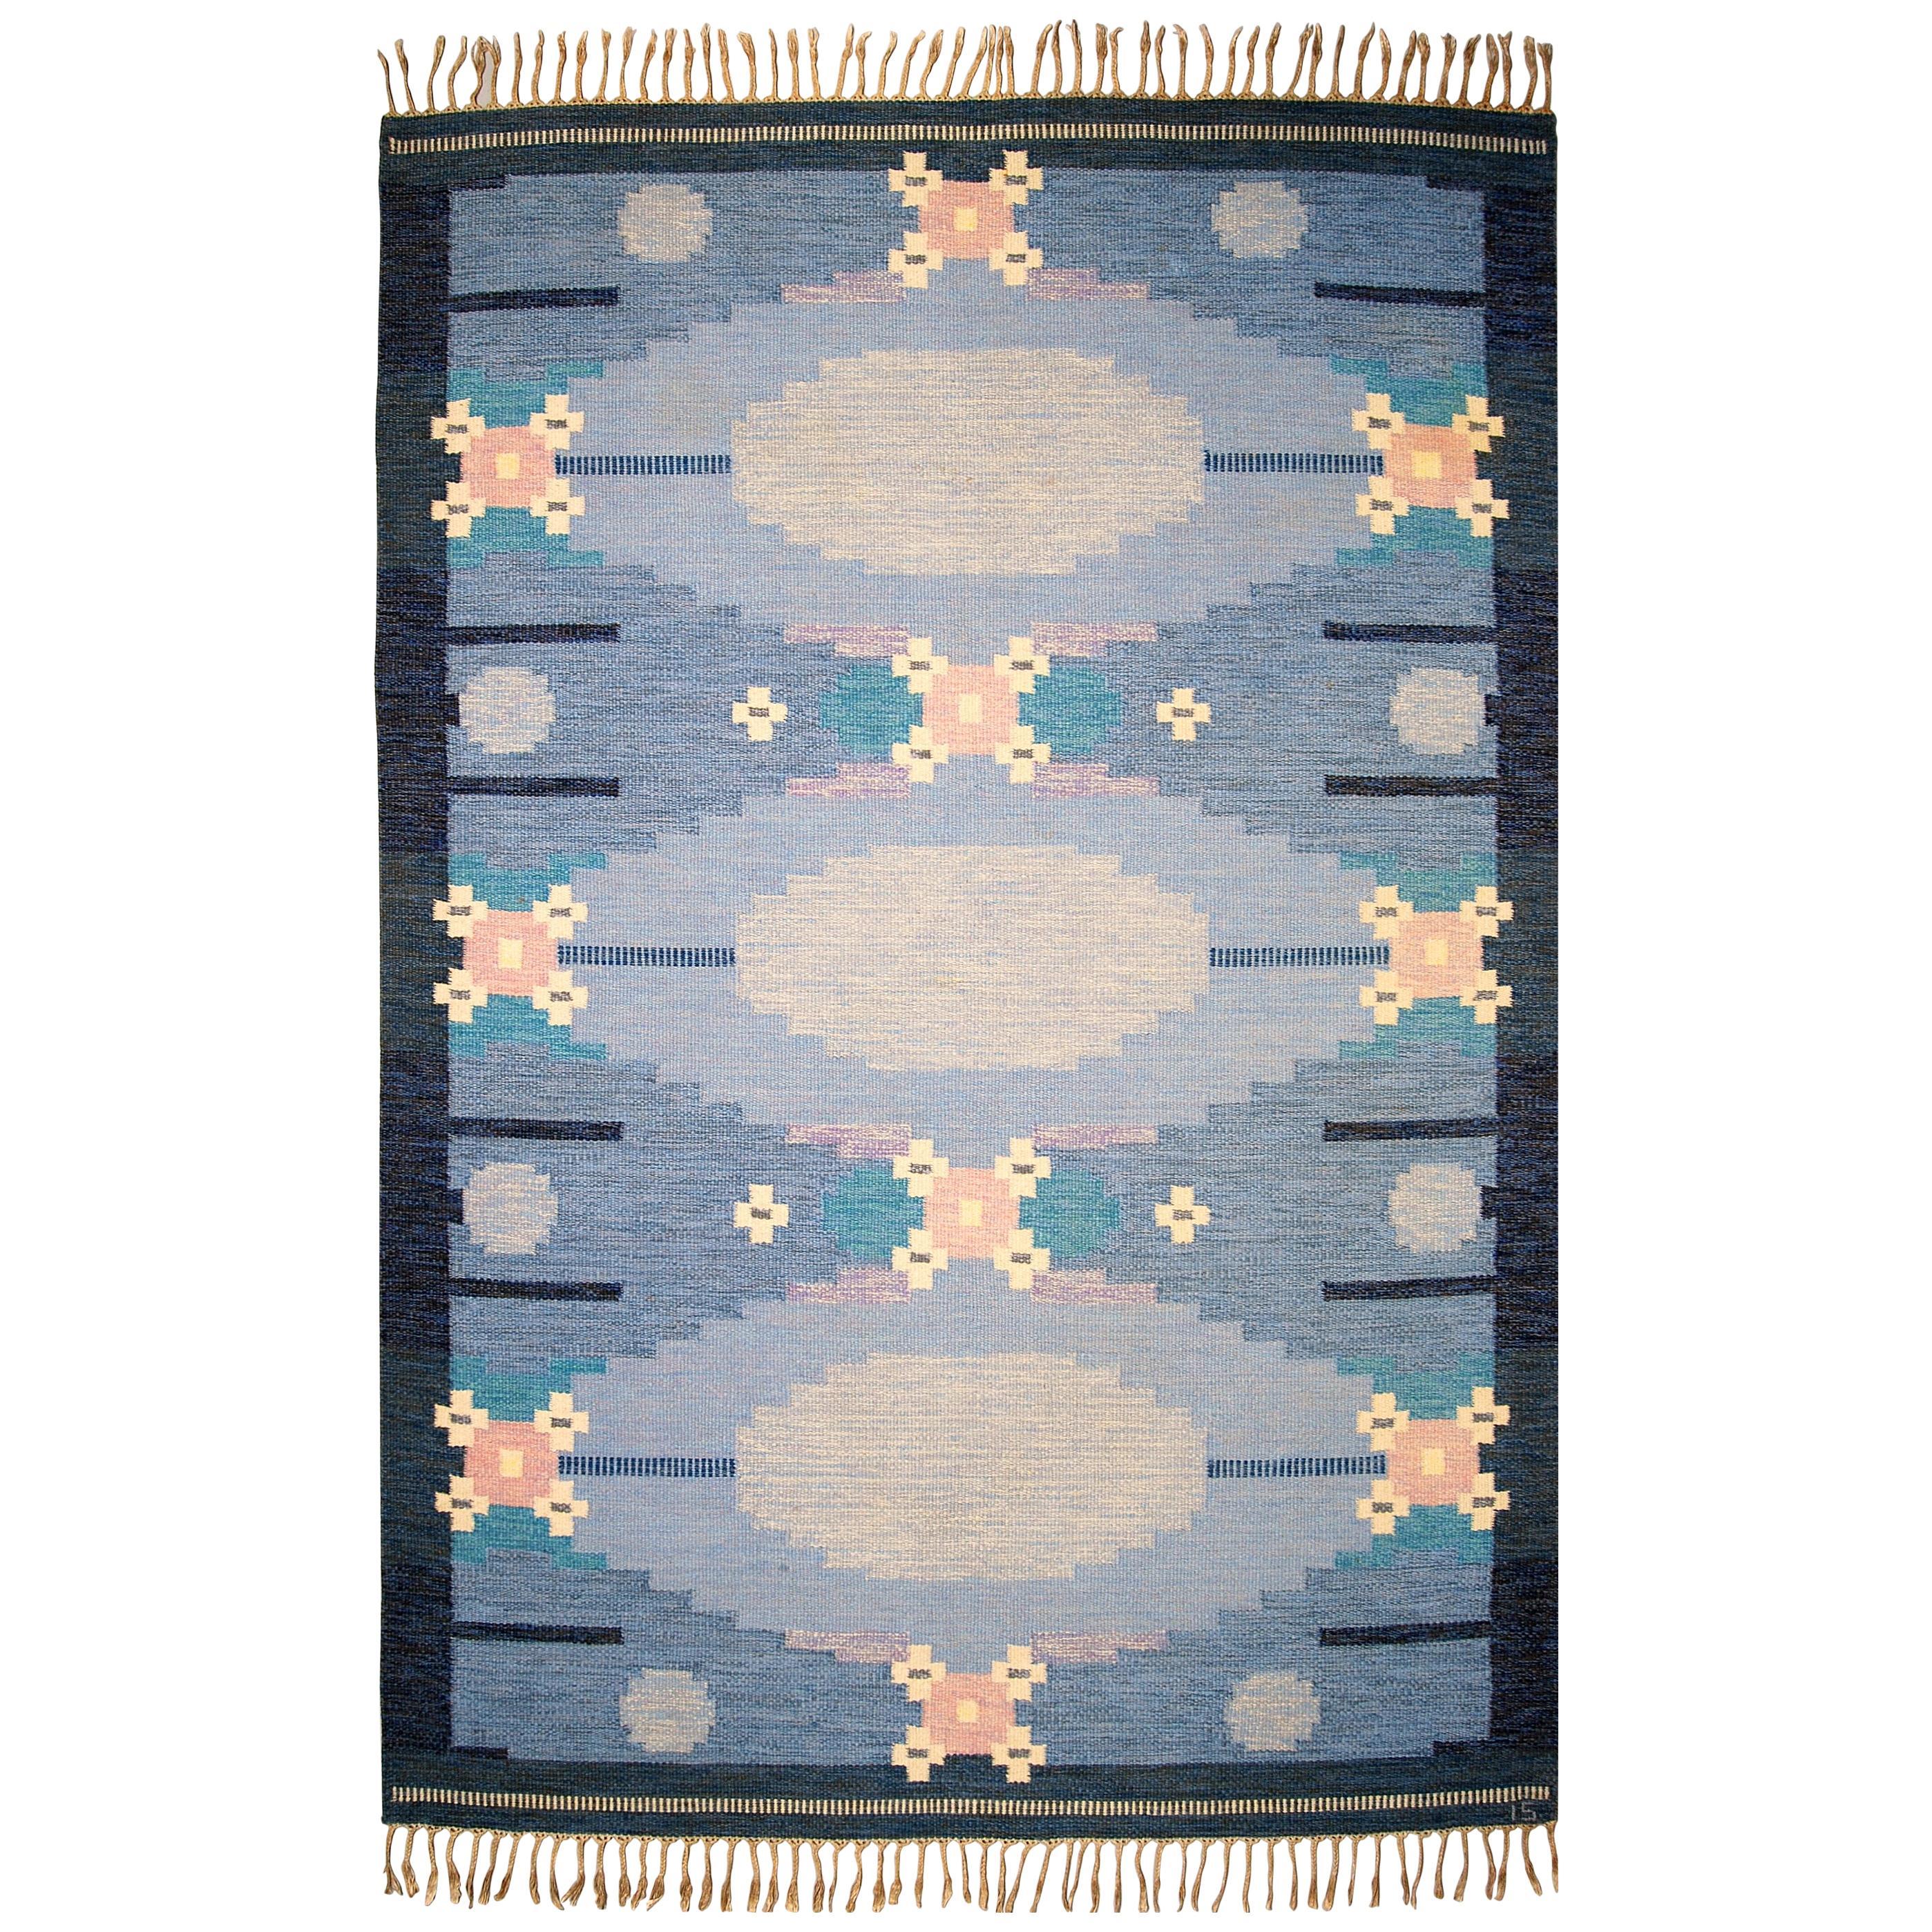 Very Large Swedish Flat-Weave Rölakan Carpet by Ingegerd Silow